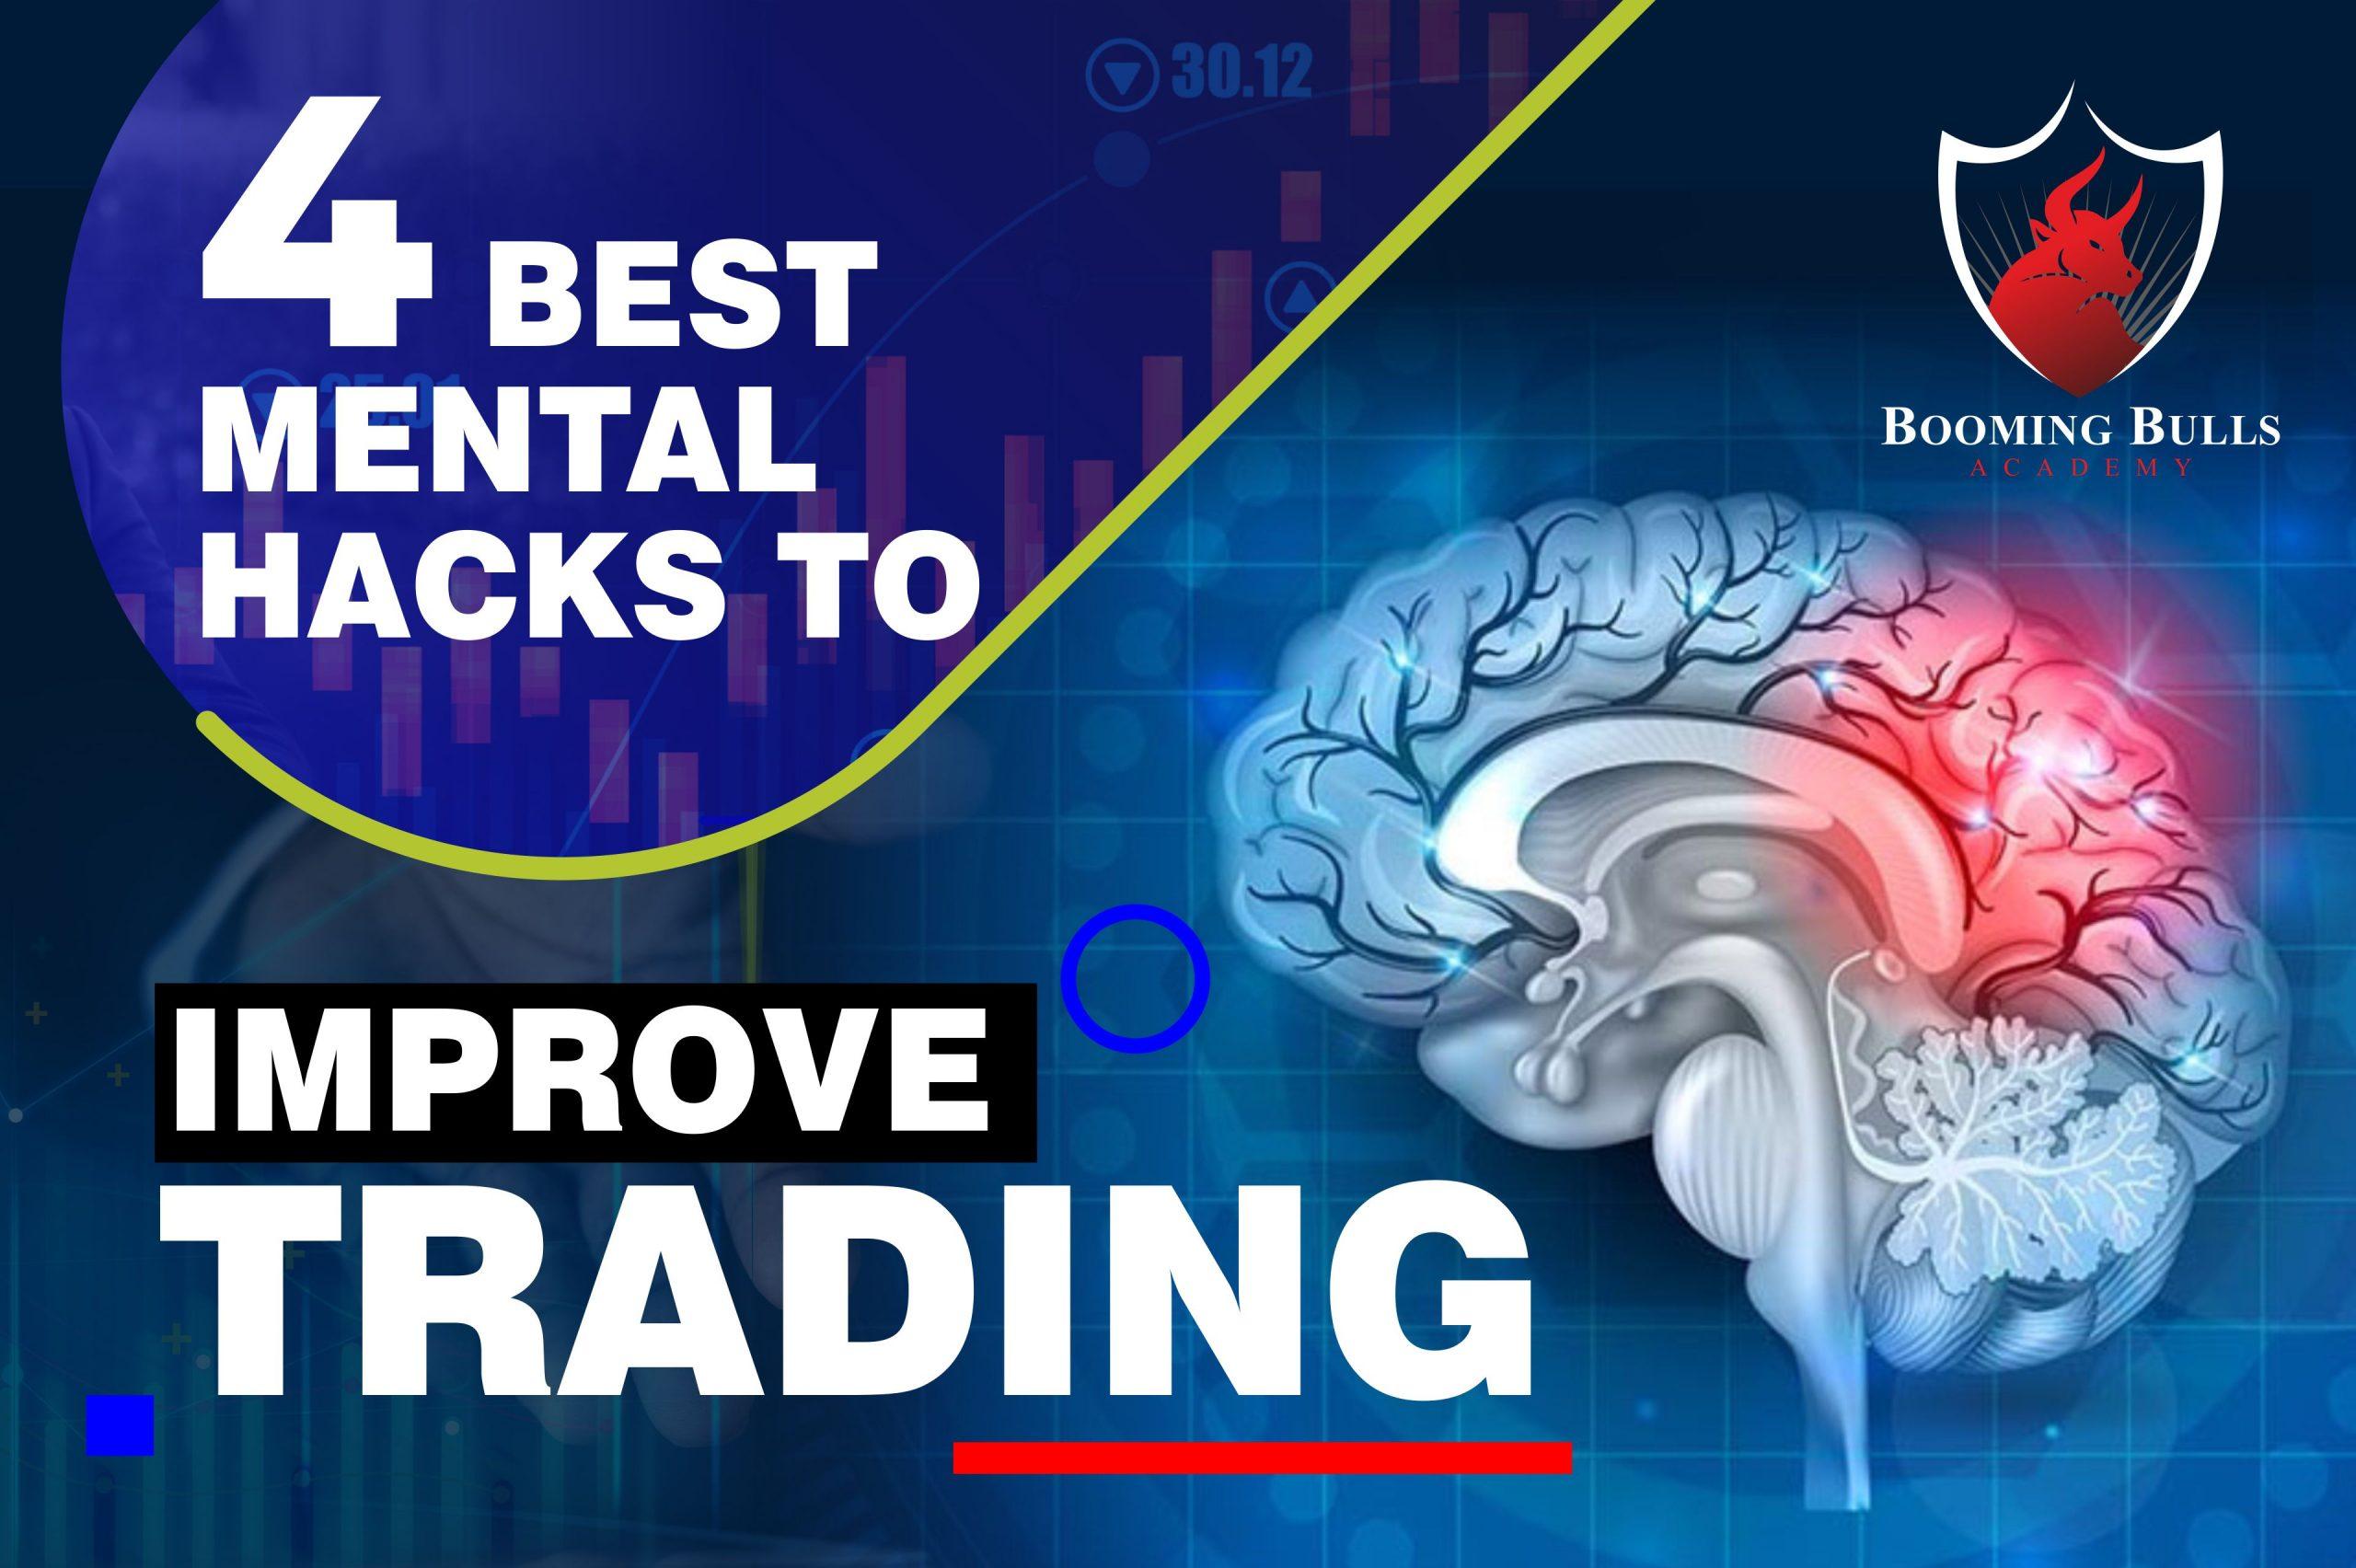 4 Best Mental Hacks To Improve Trading